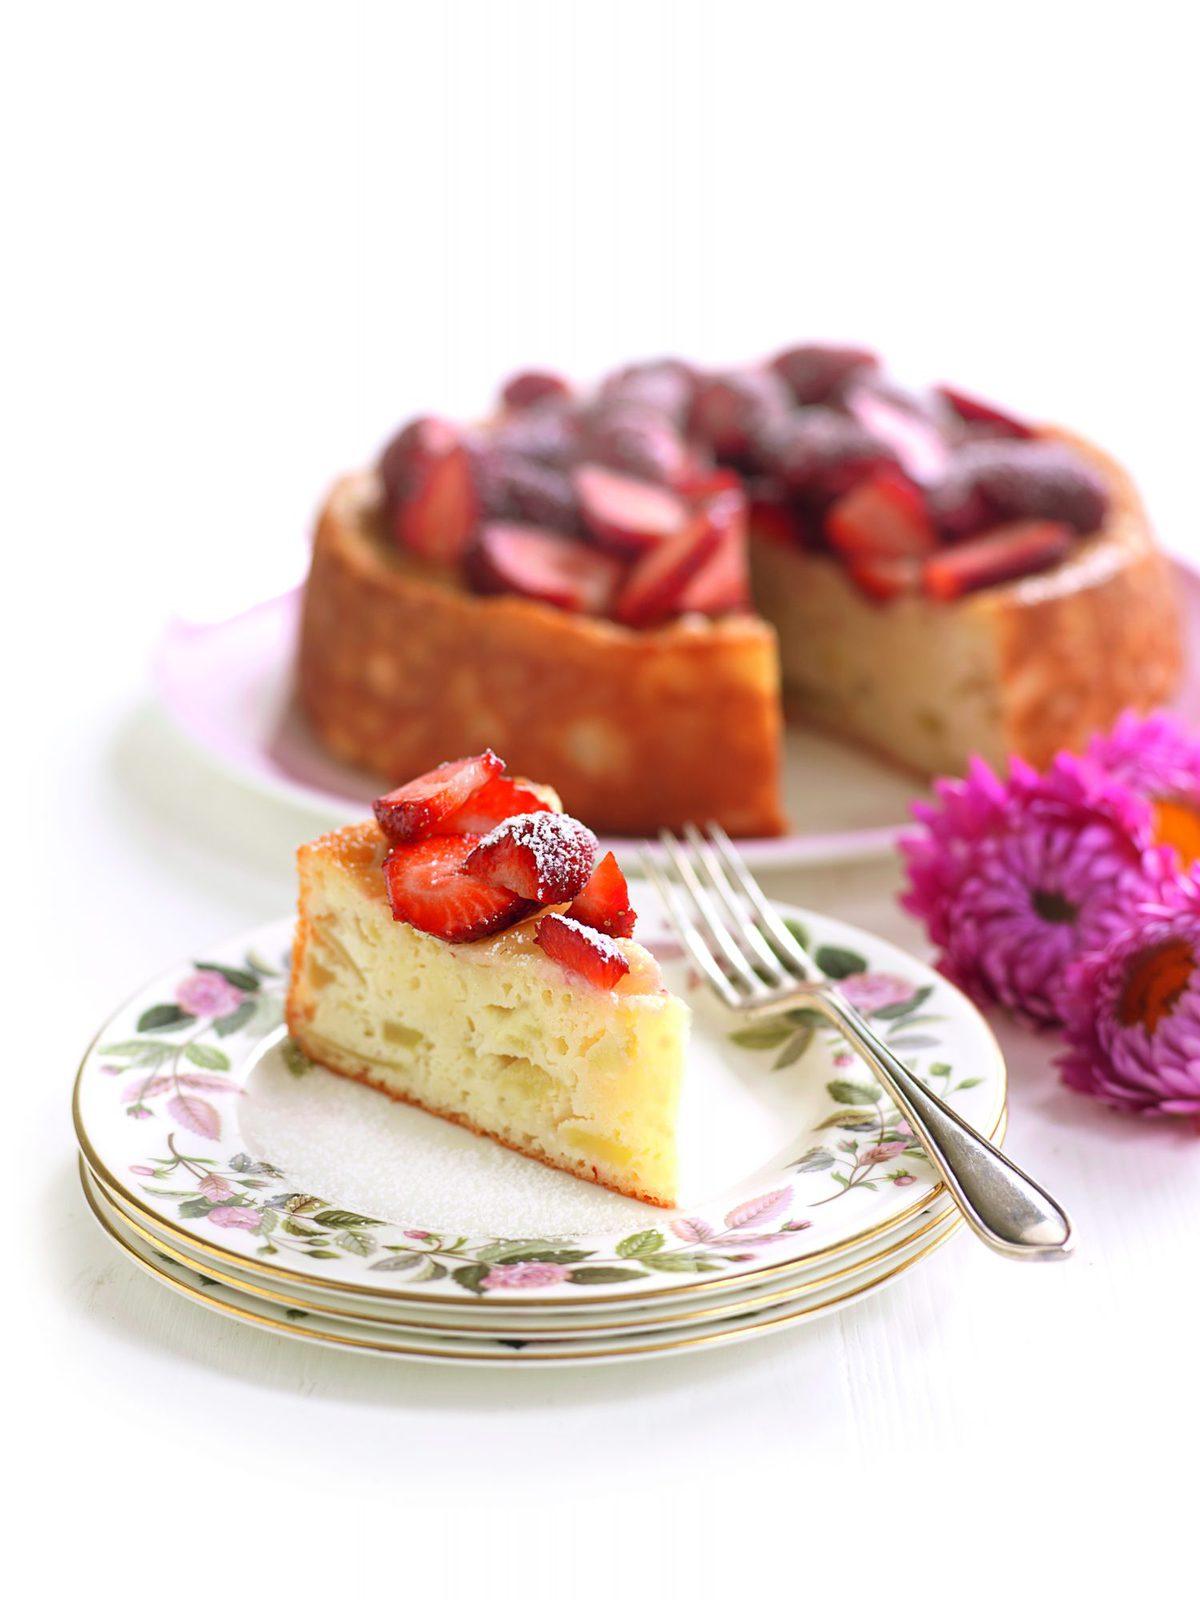 Apple and yoghurt cake